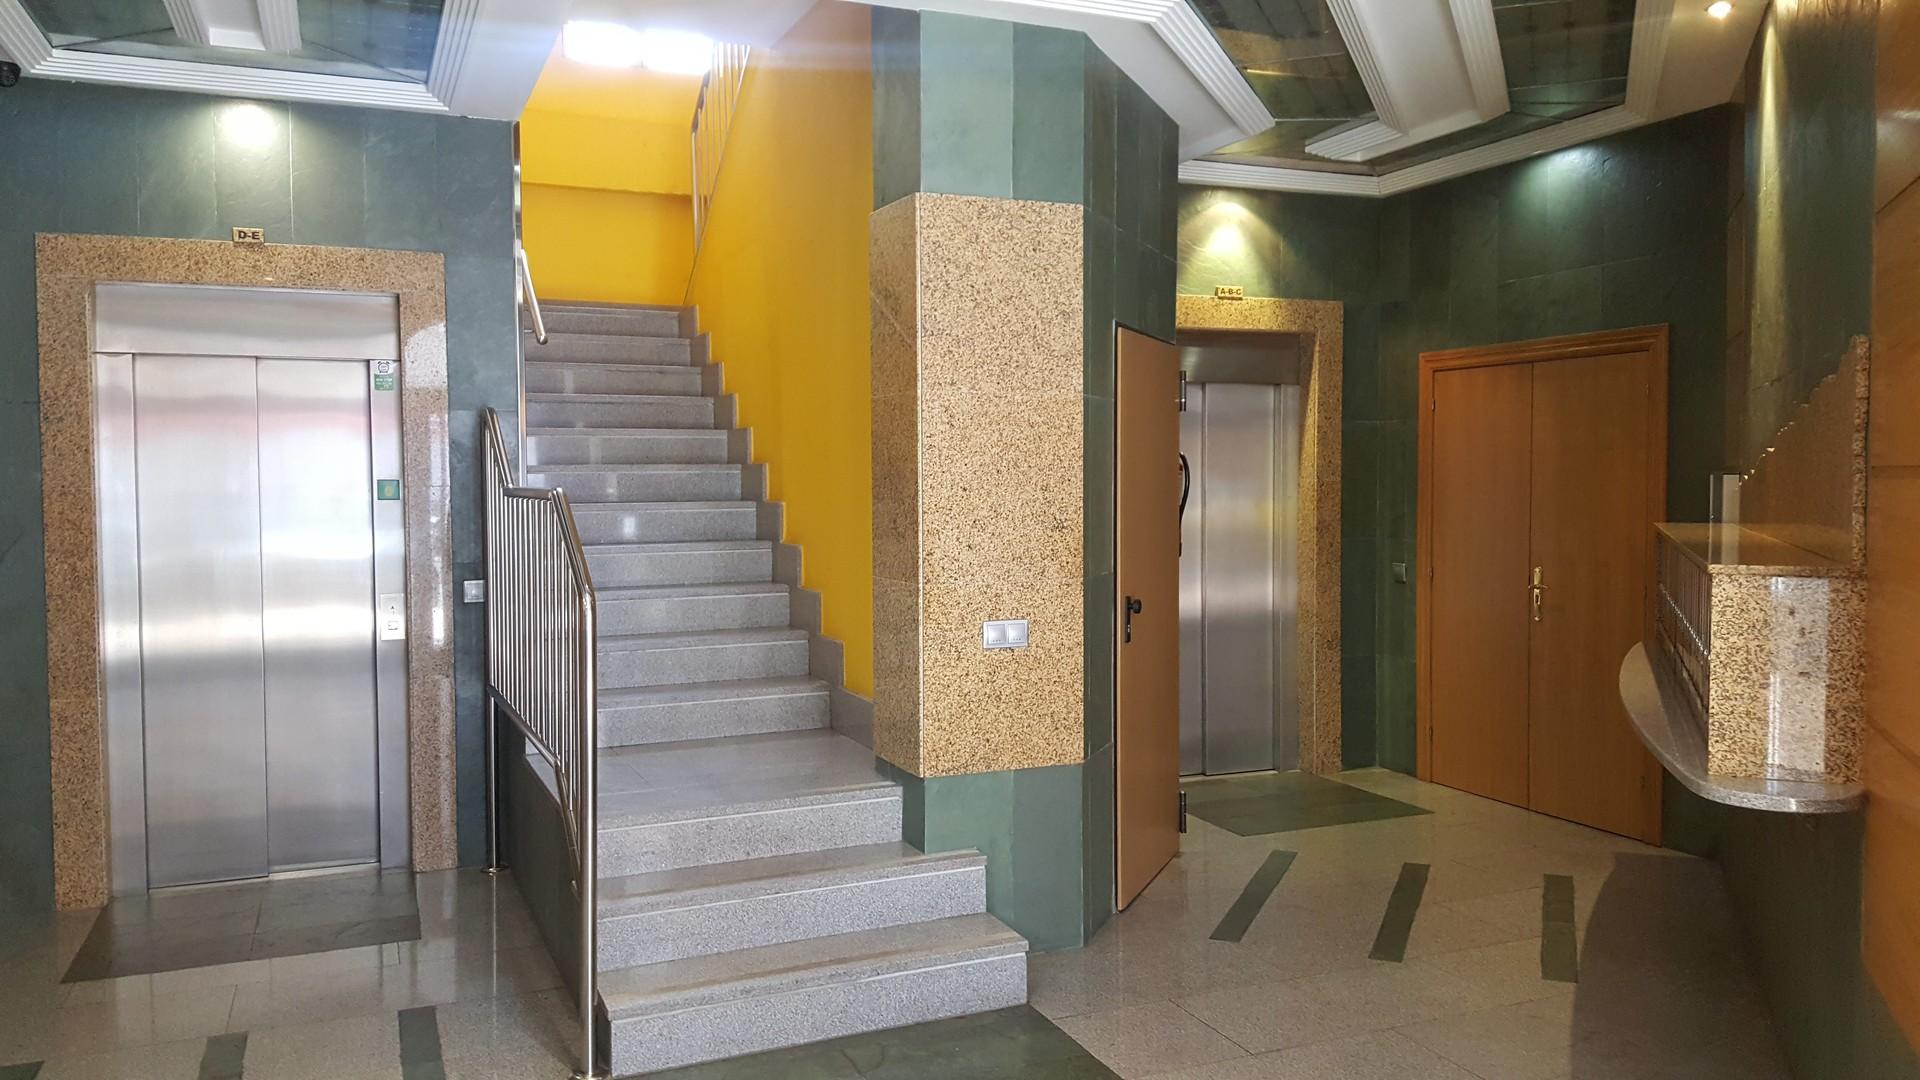 alquiler-habitacion-calle-posadera-aldonza-9-san-mames-la-palomera-leon-91503bd436d7efb51e241b80377b3d50